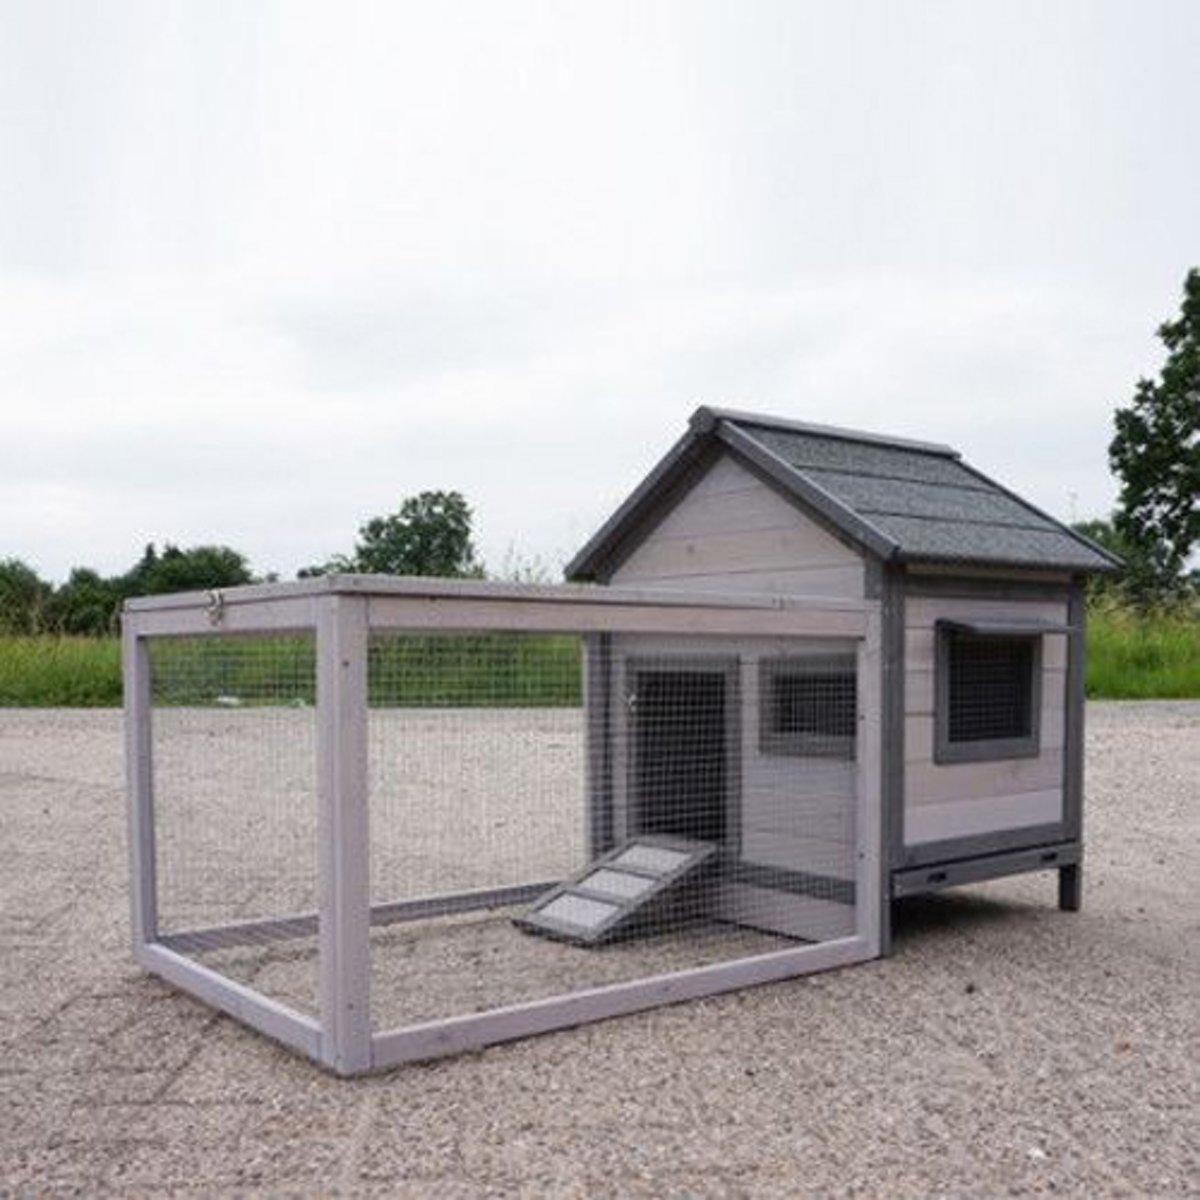 Petstar Konijnenhok Ava Cottage - 75 x 146 x 83 cm - Wit/Grijs